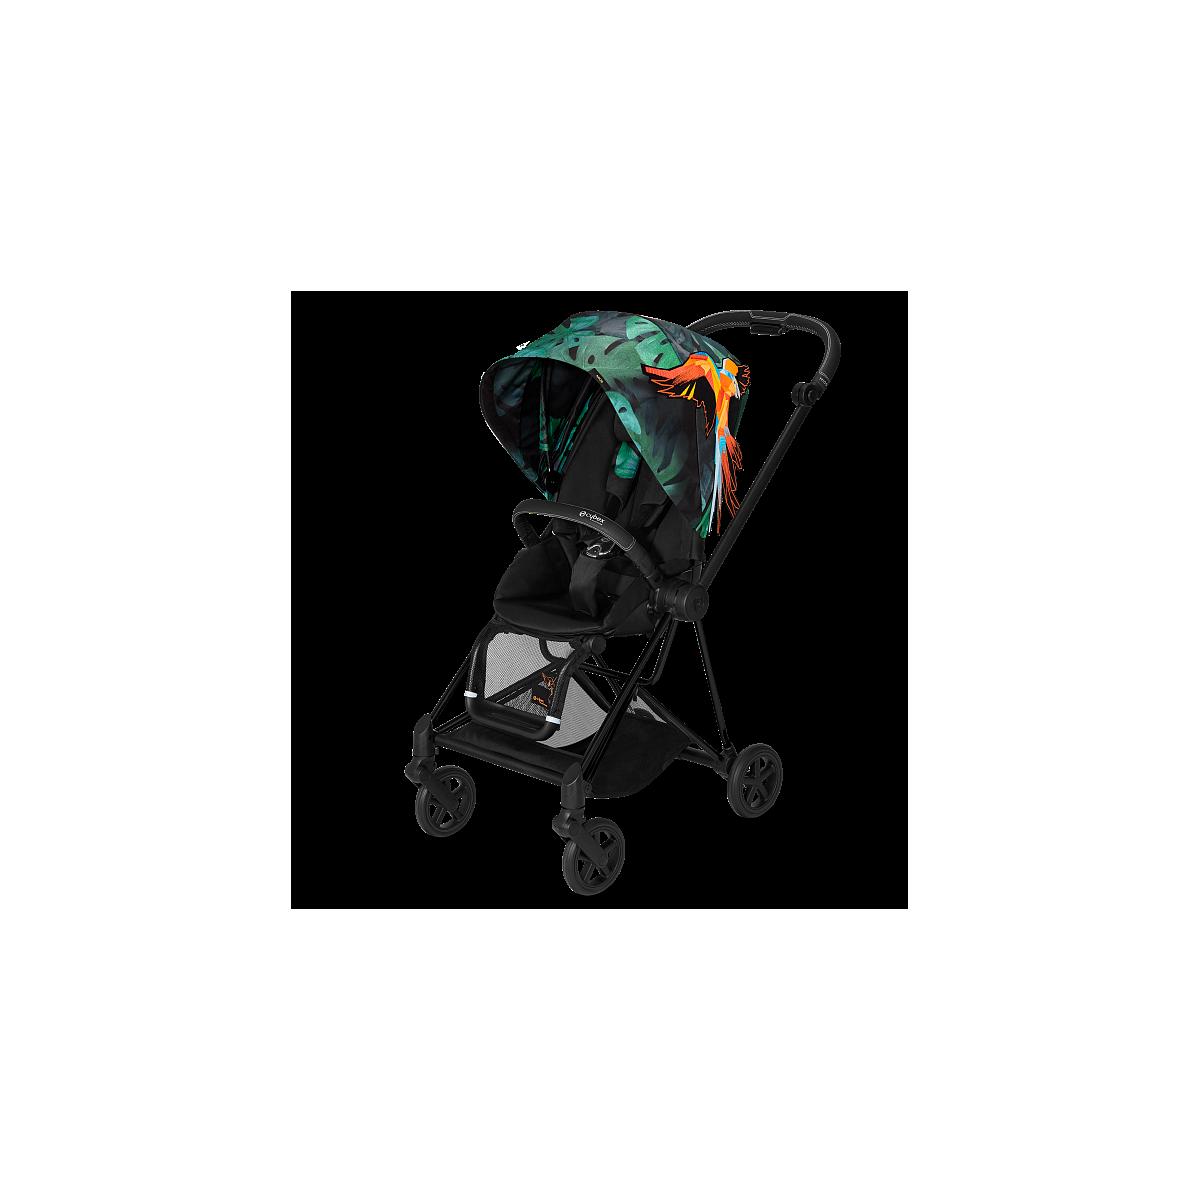 Chasis carrito MIOS Cybex matt black-black